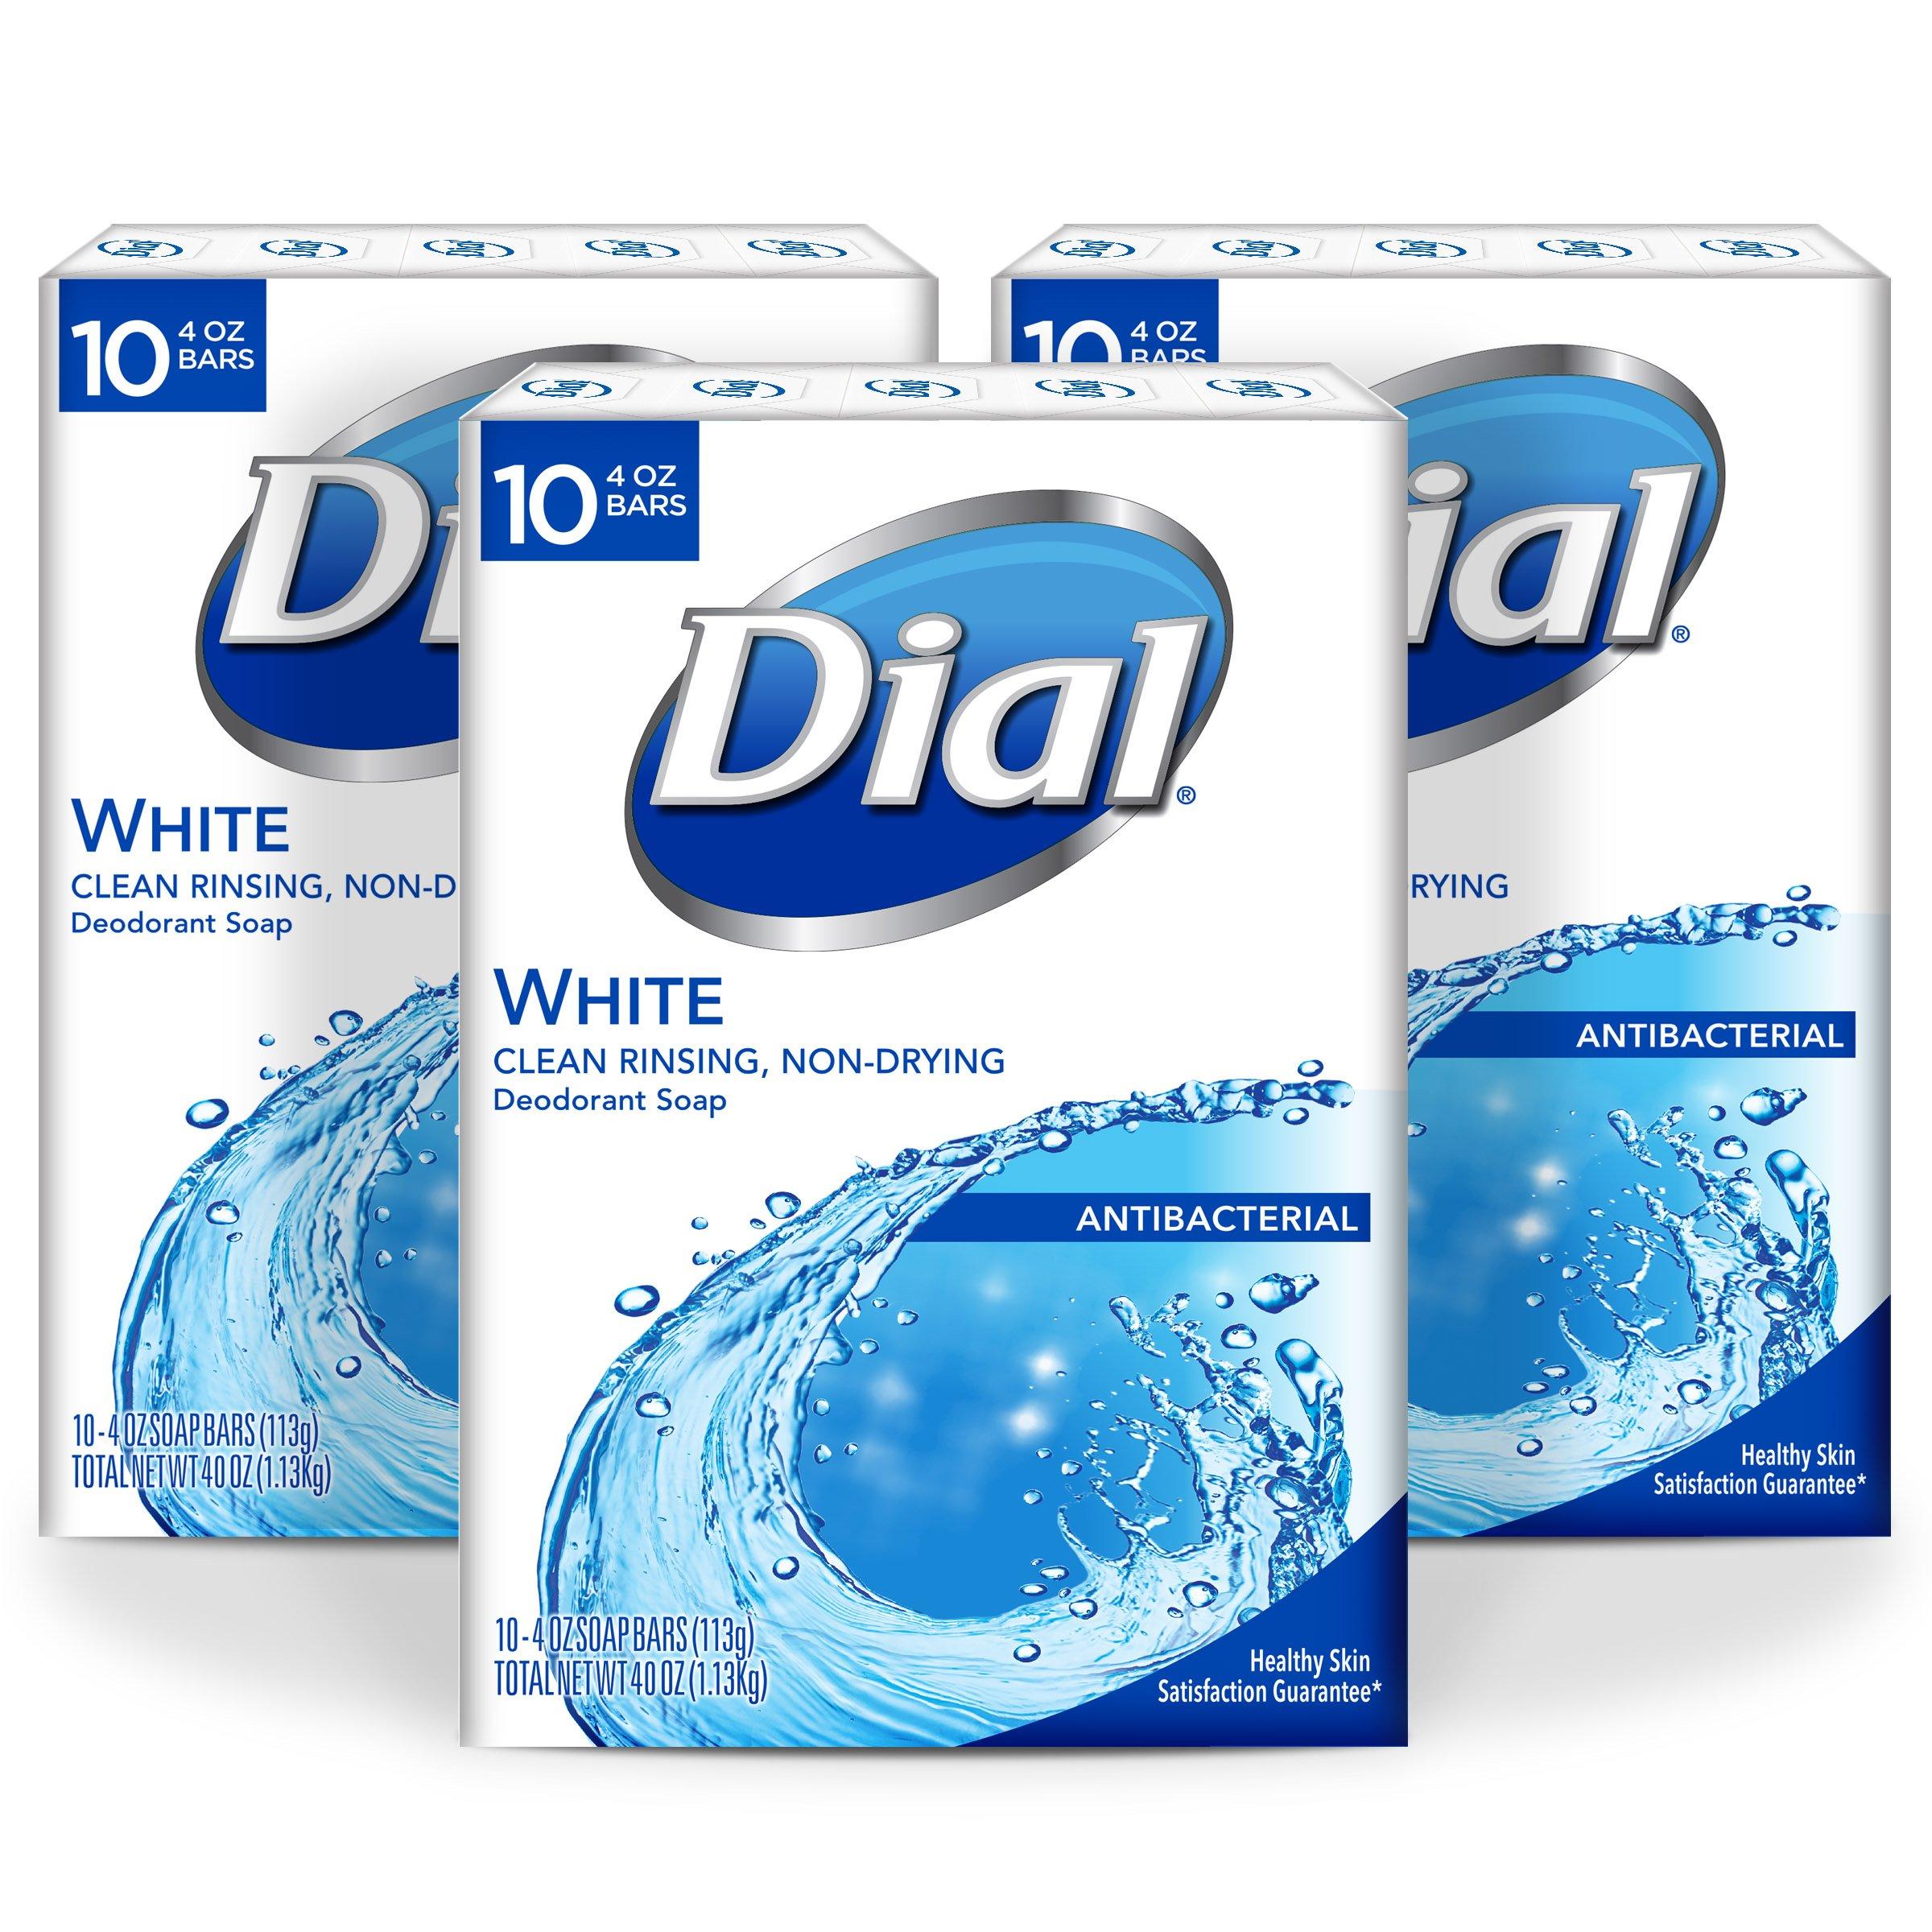 Dial Antibacterial Bar Soap, White, 4 Ounce, 30 Bars